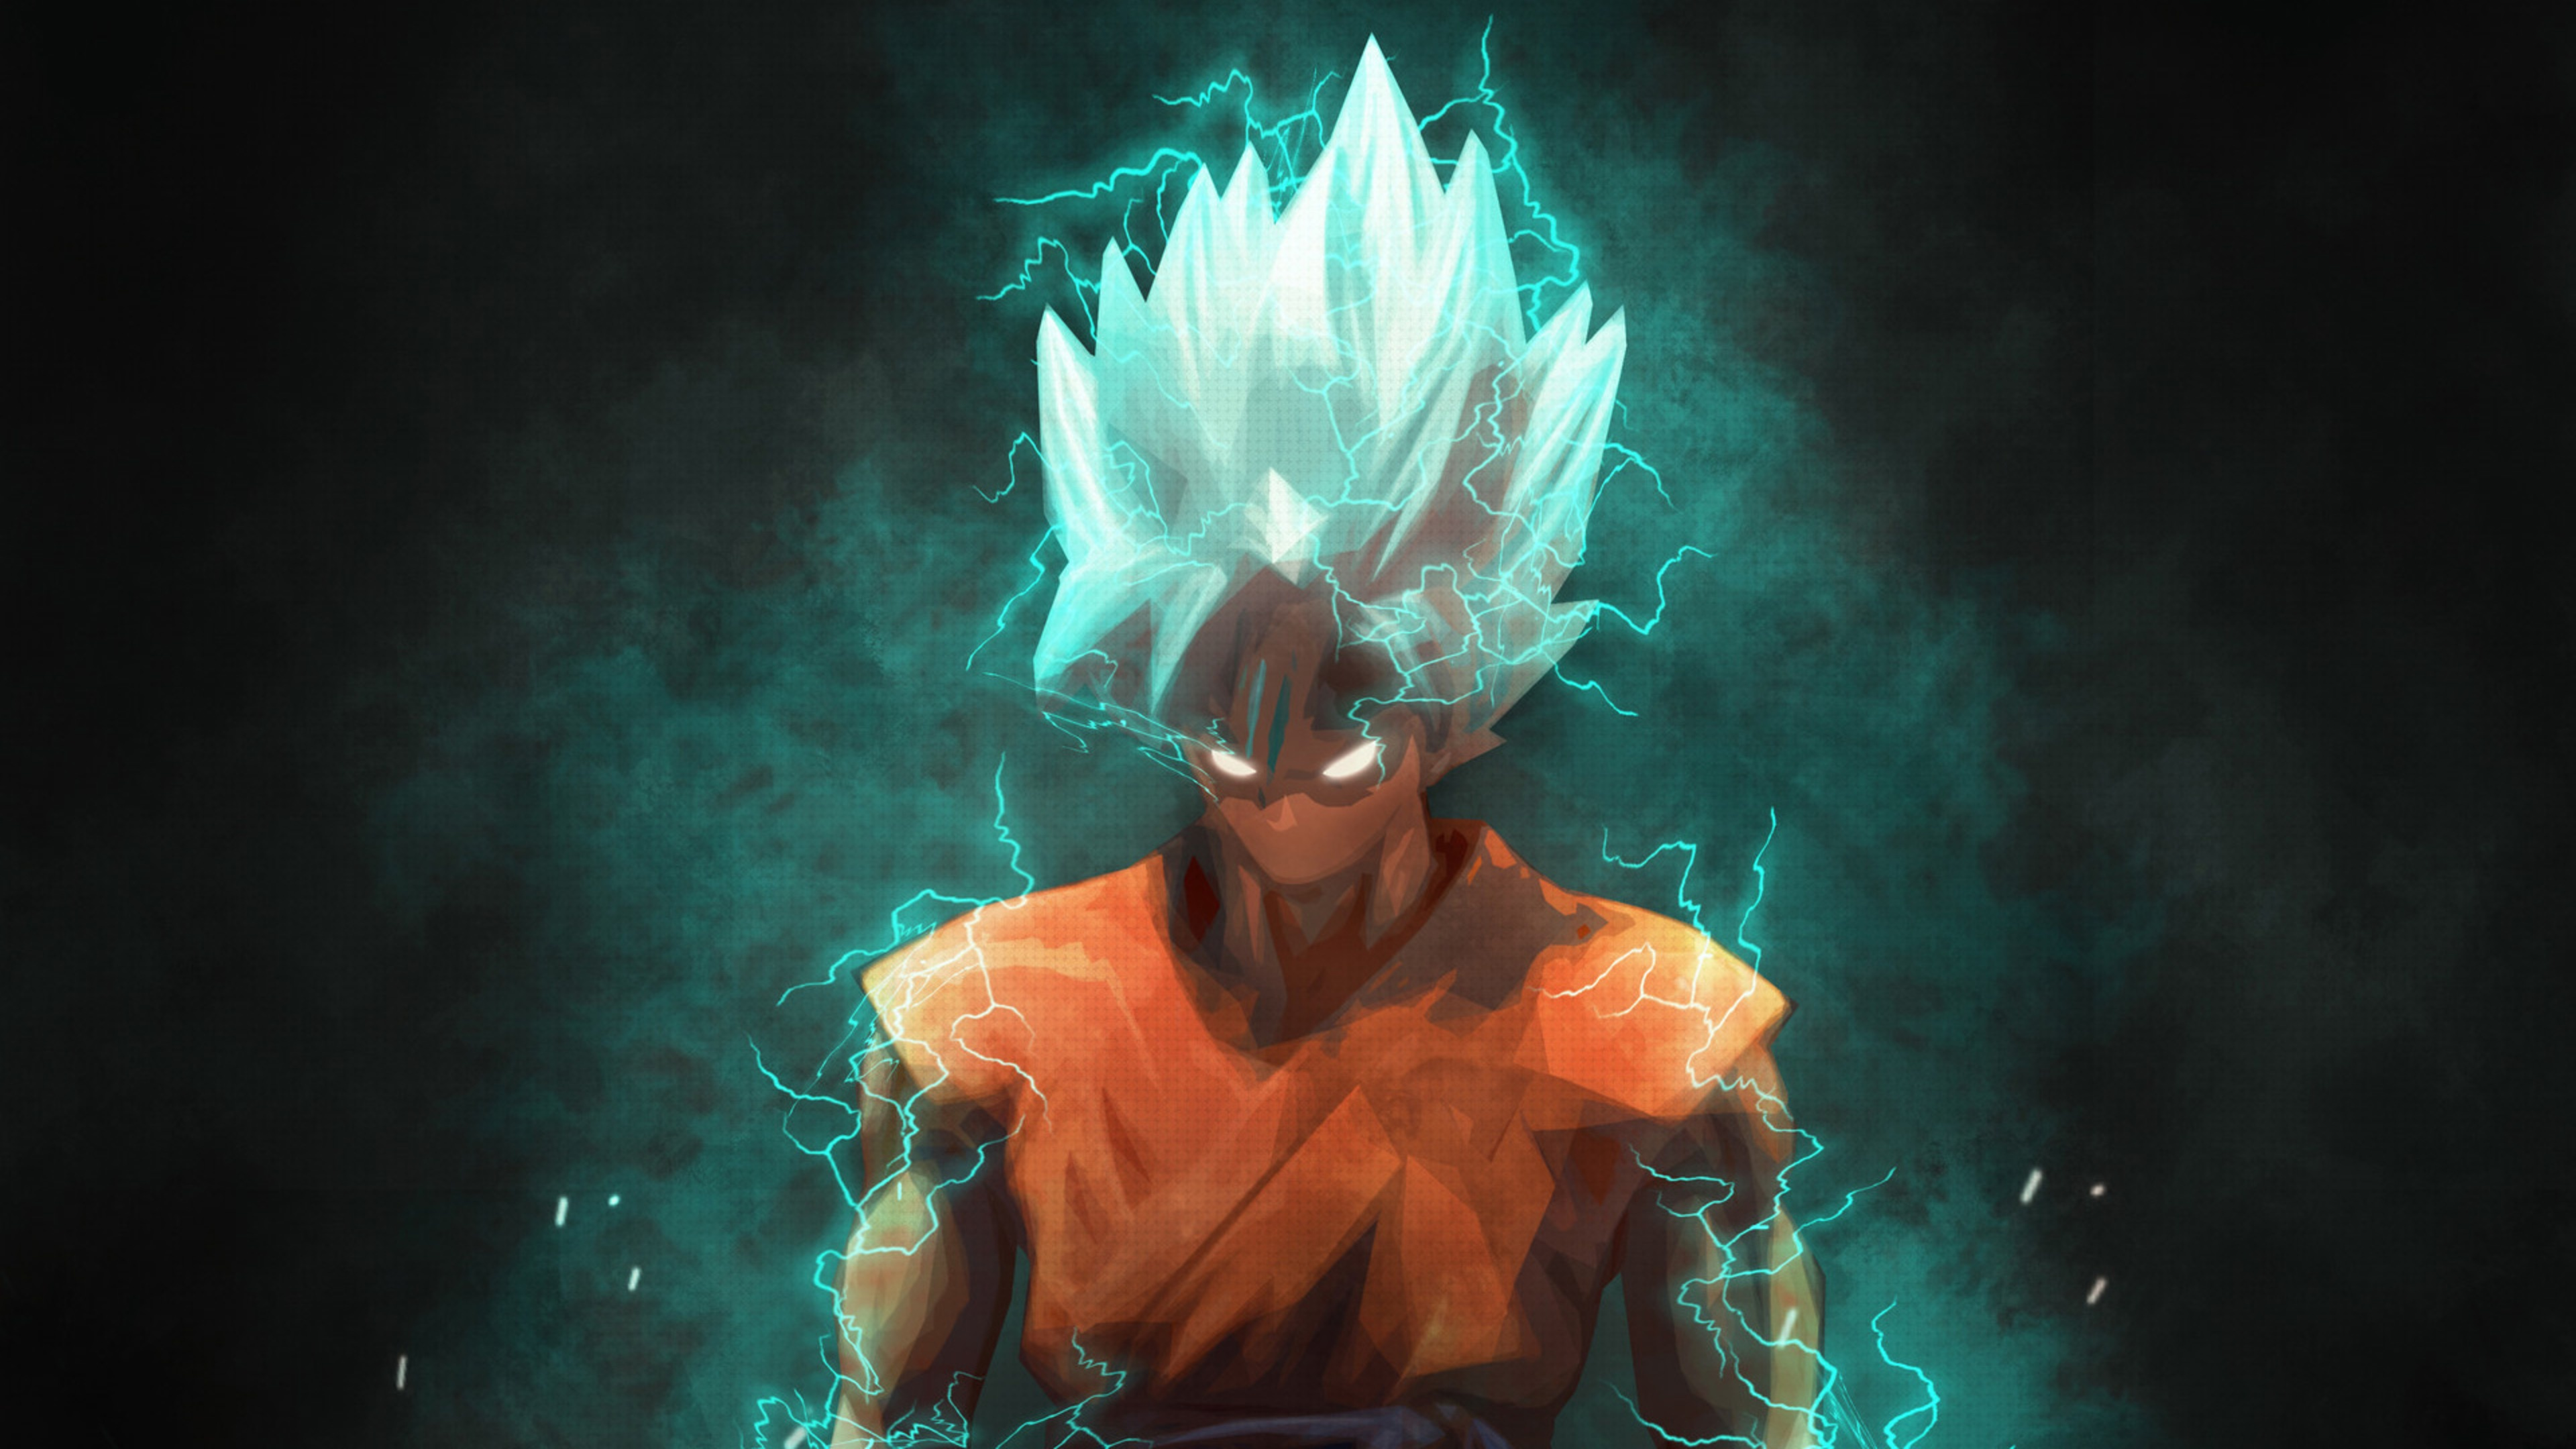 Goku wallpaper hd